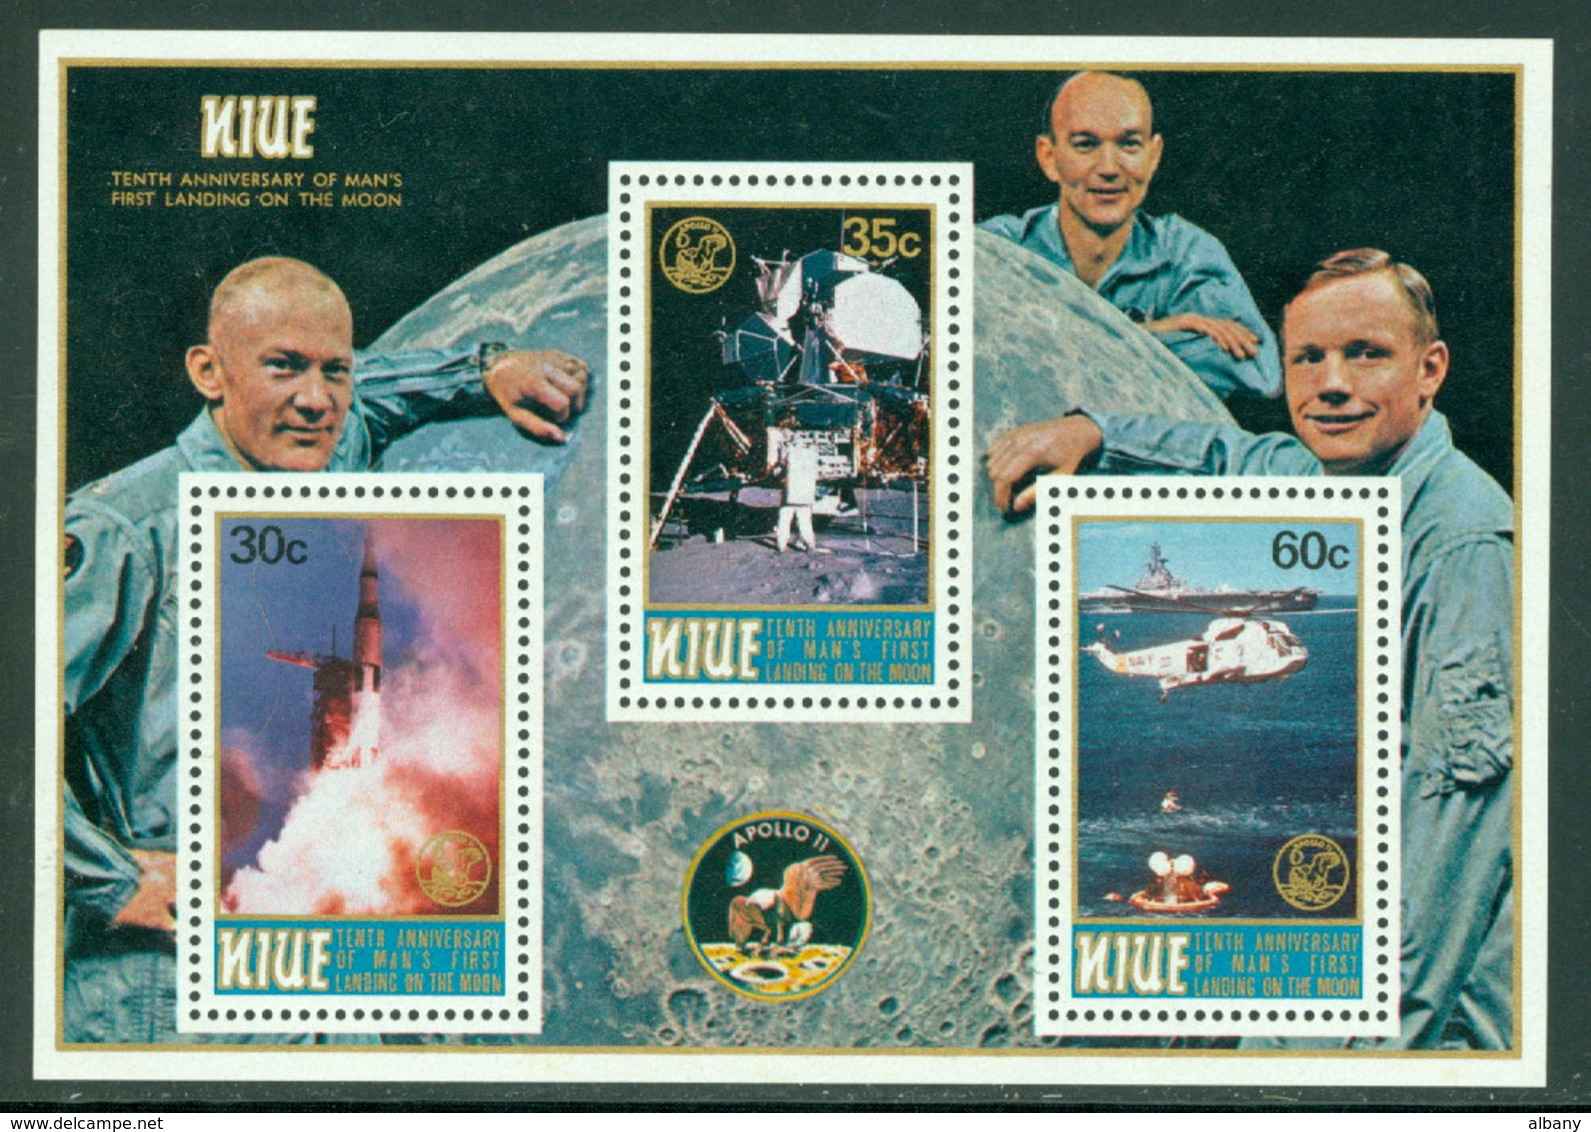 Niue Apollo 11 Landing On The Moon, 10th Anniversary Neuf** Sans Charniere, Mint NH - Niue